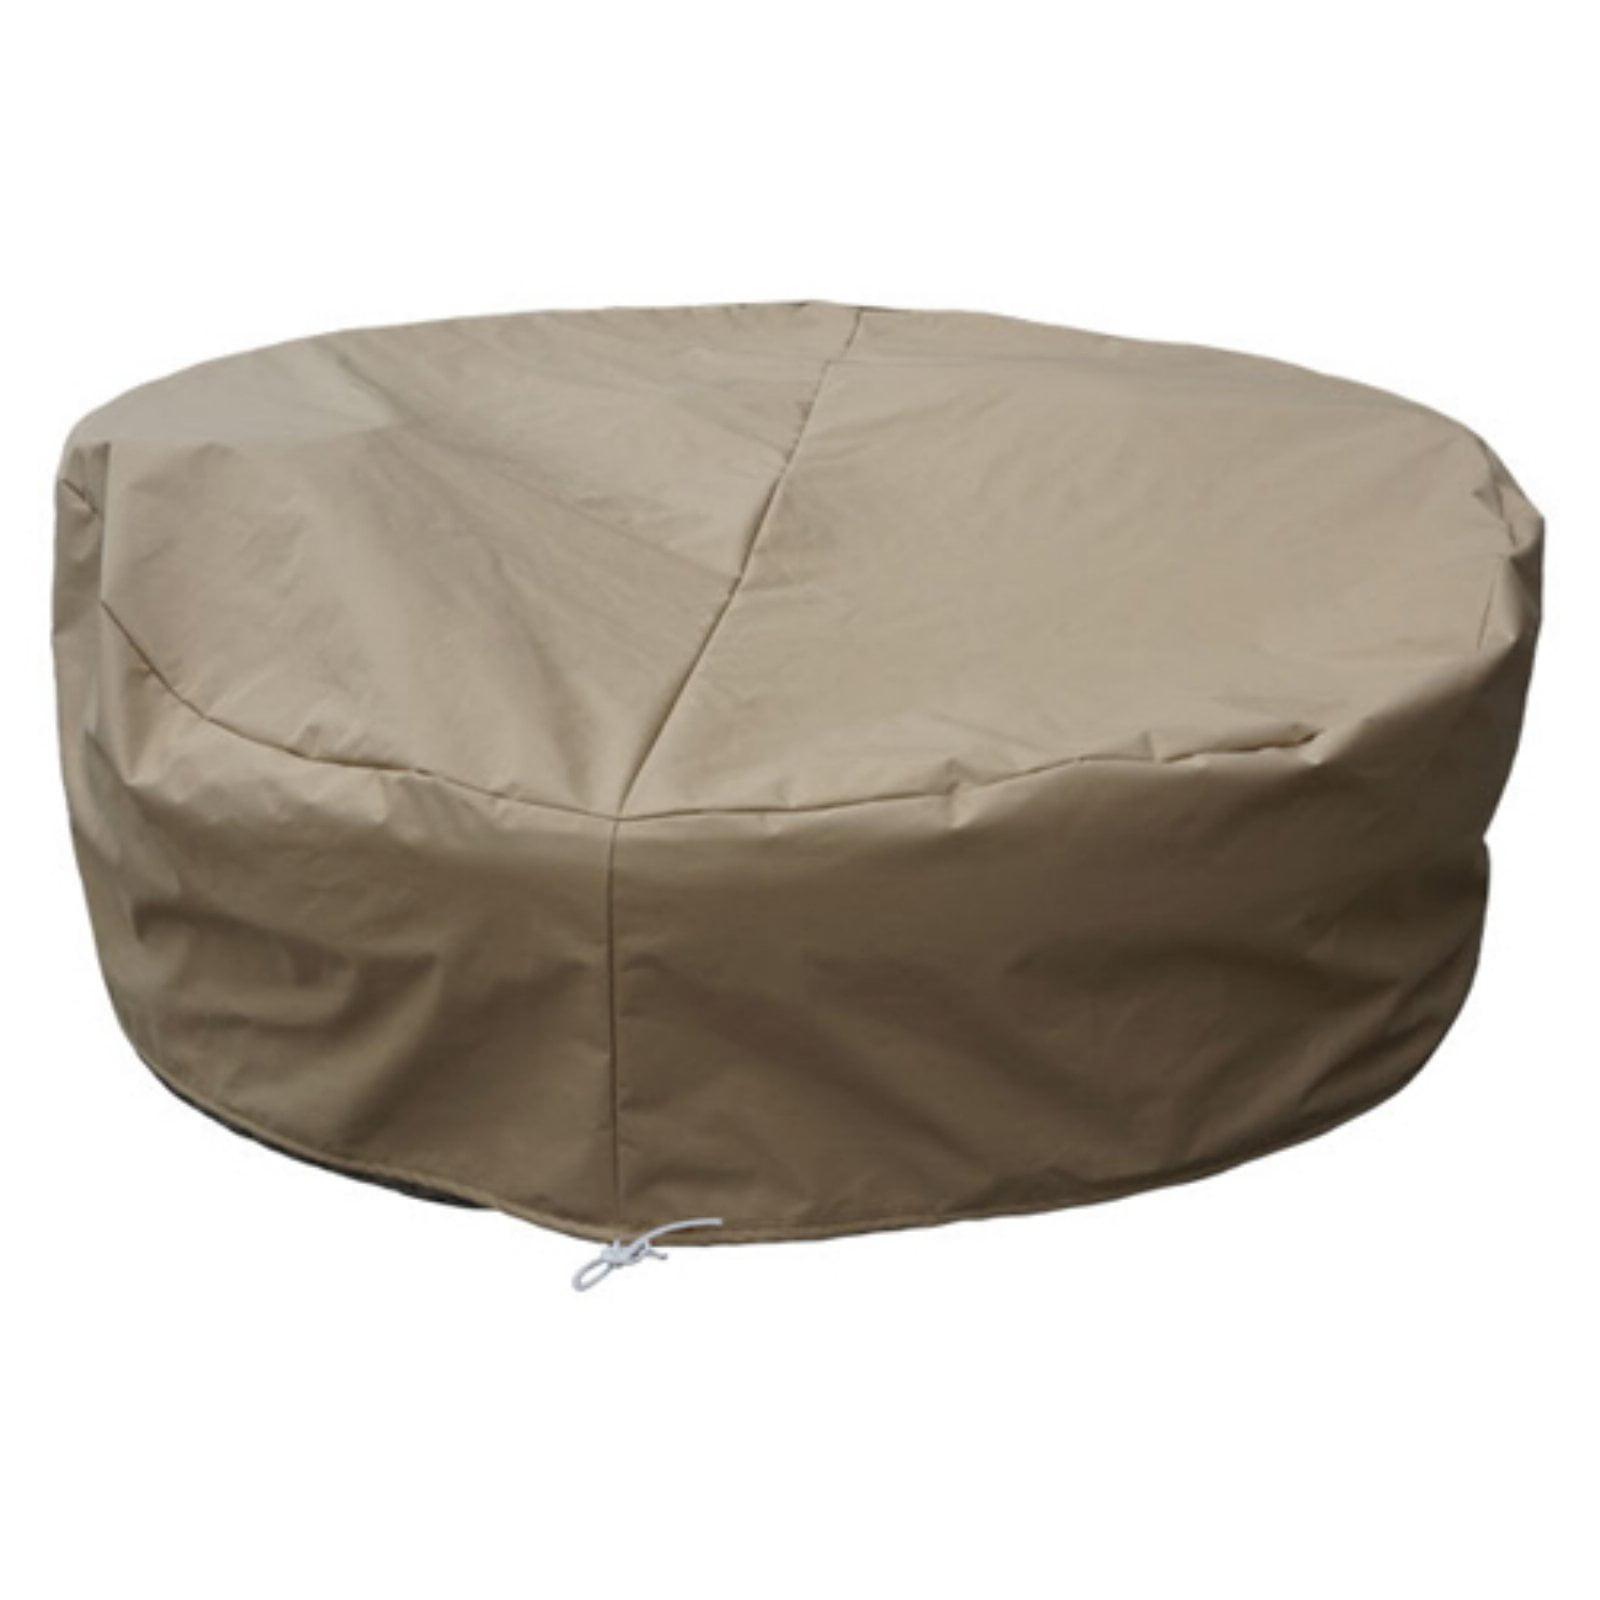 TK Classics Sun Bed Protective Cover